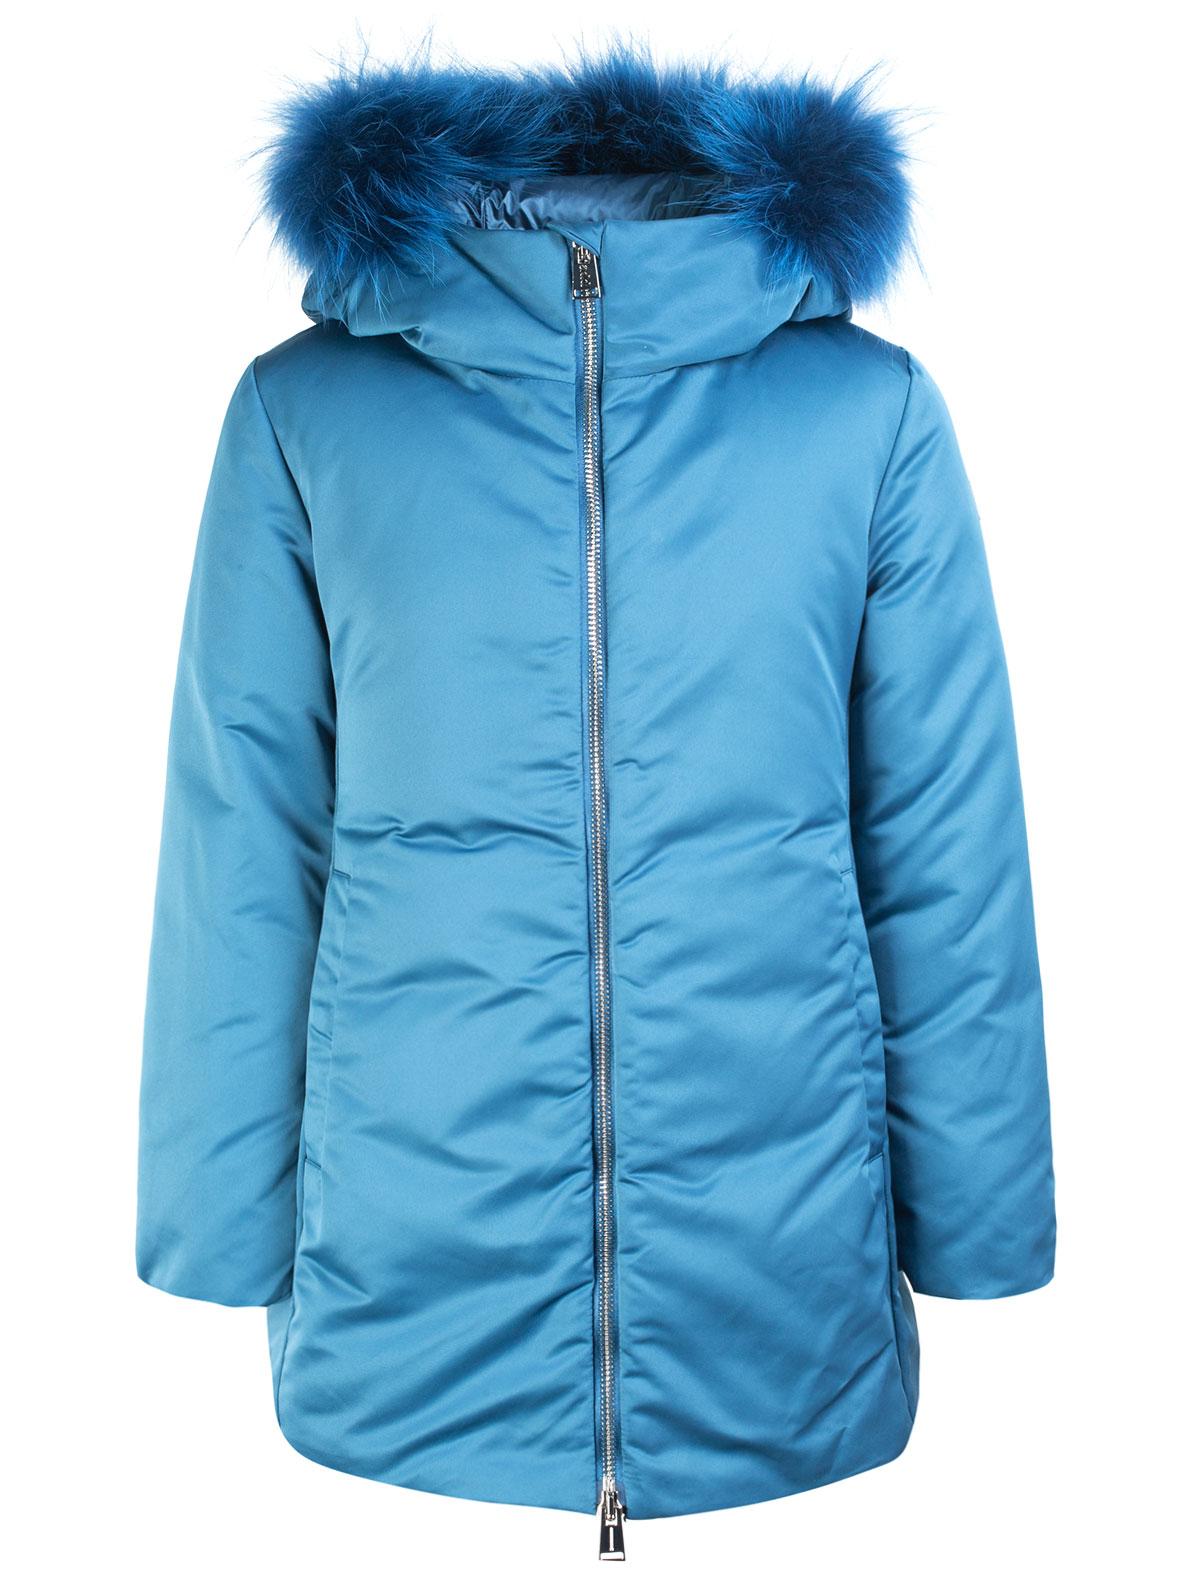 Купить 1873576, Куртка ADD, синий, Женский, 1071409680307